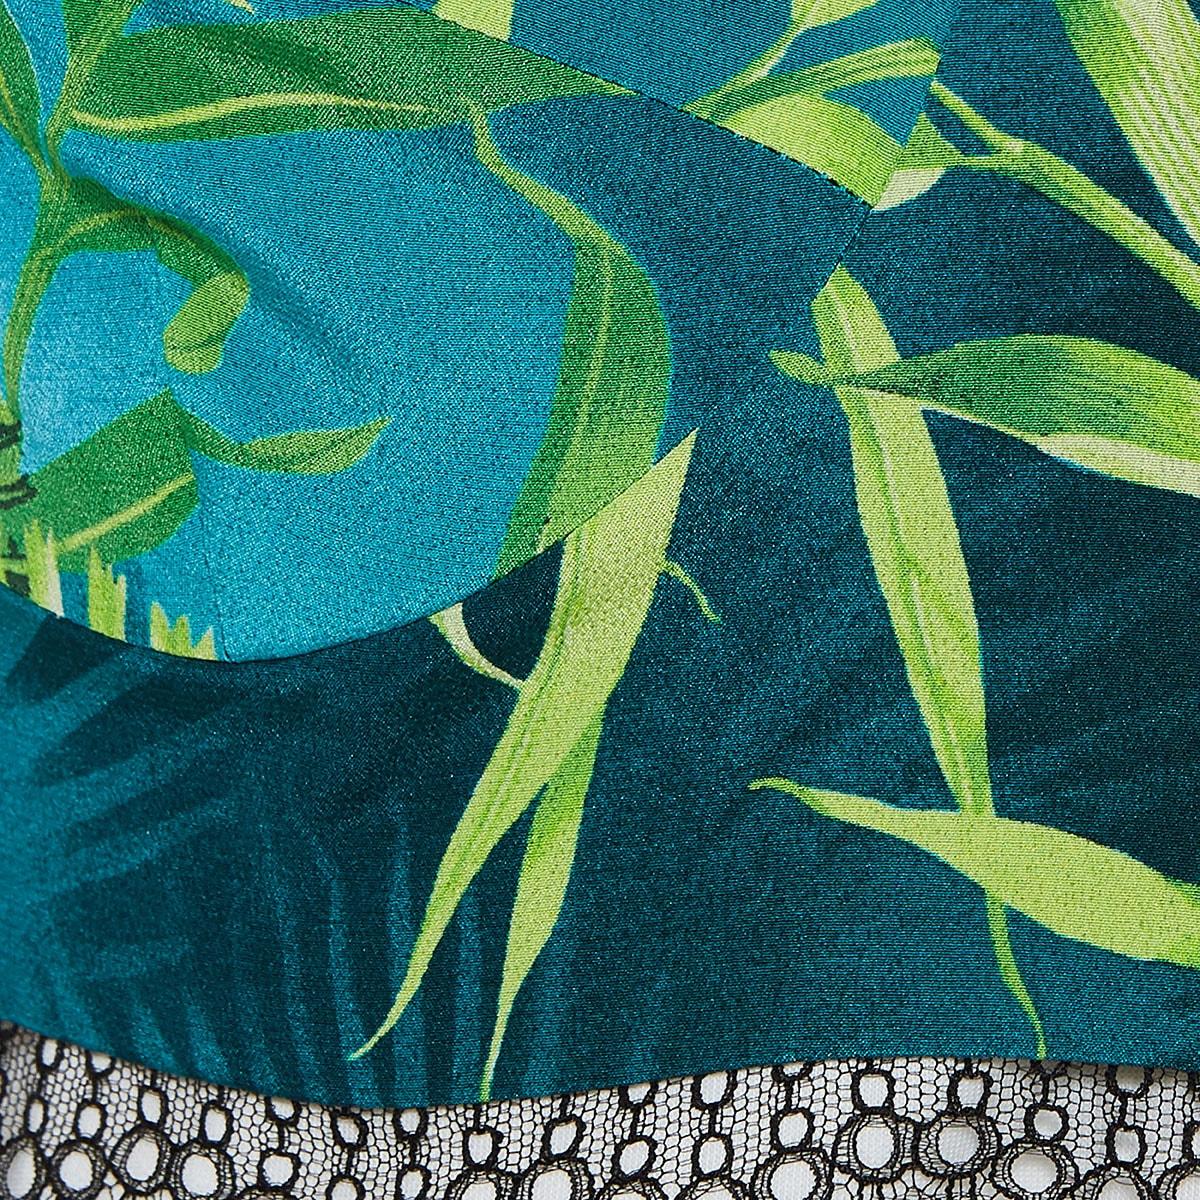 Lace-trimmed jungle print bralette top